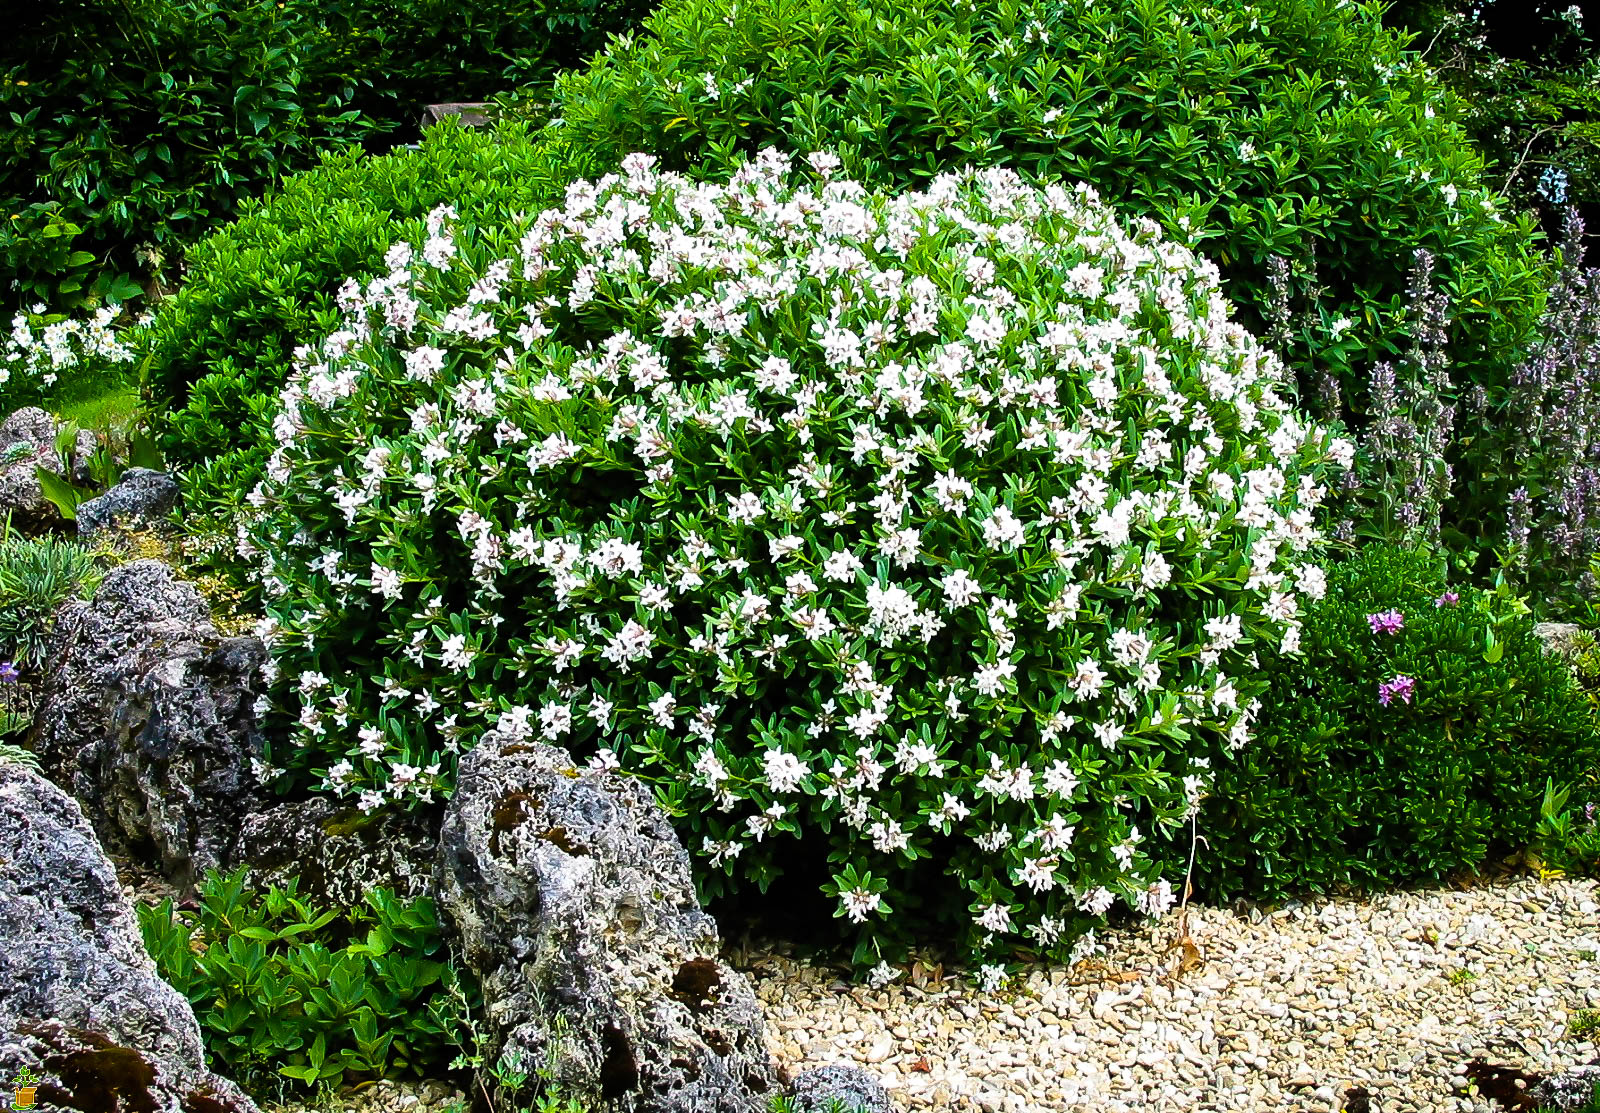 3 Gallon Gardenia blooming white flower plant- Shrub hedge Live